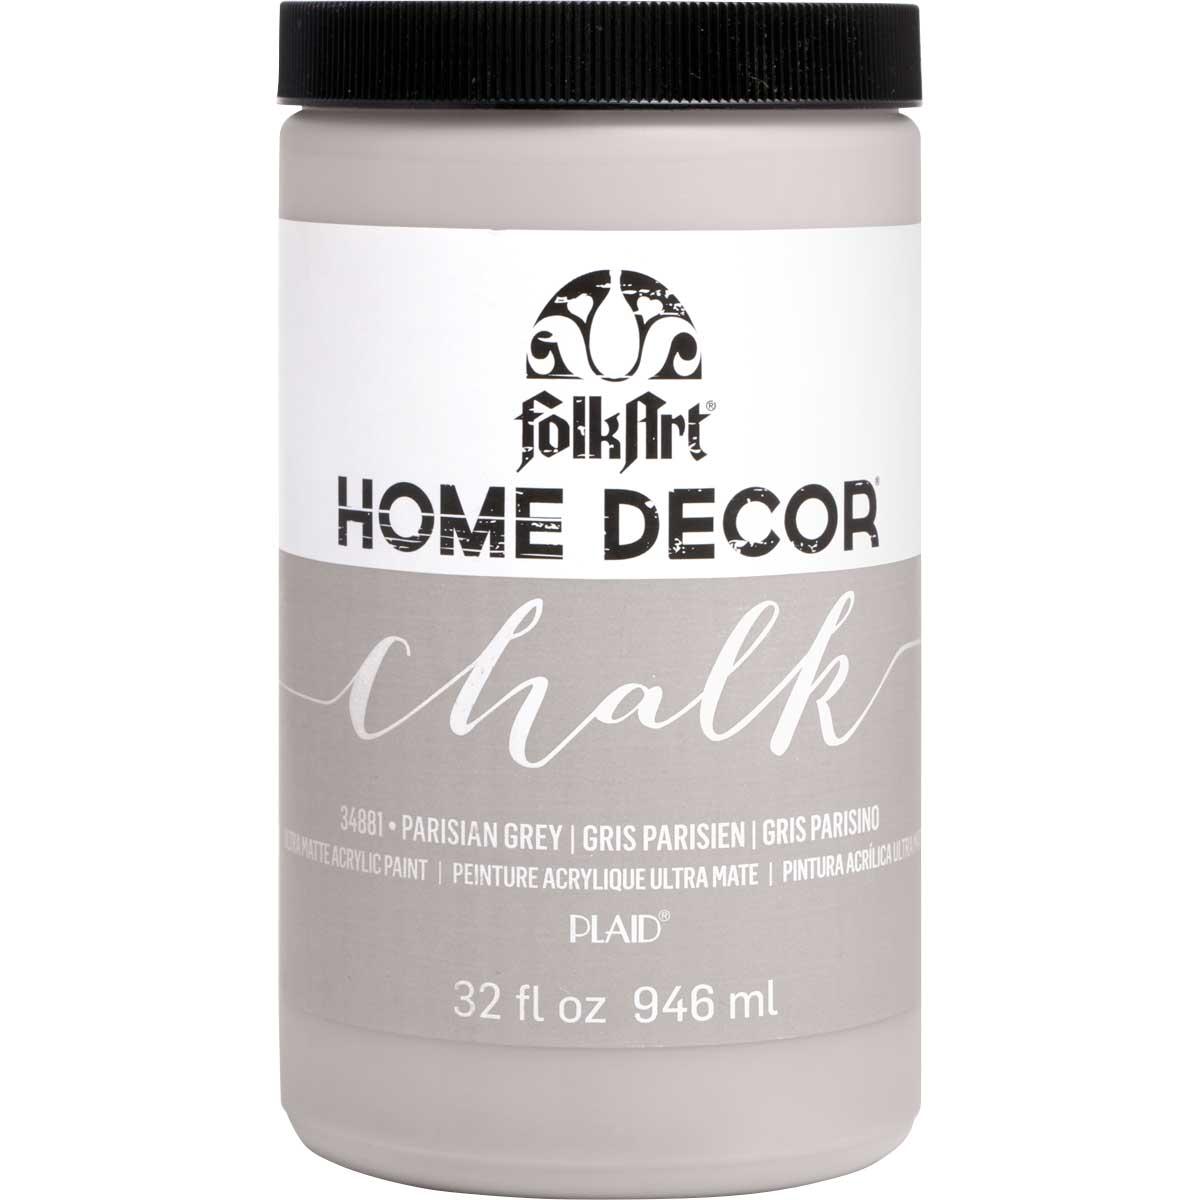 Shop Plaid Folkart Home Decor Chalk Parisian Grey 32 Oz 34881 34881 Plaid Online